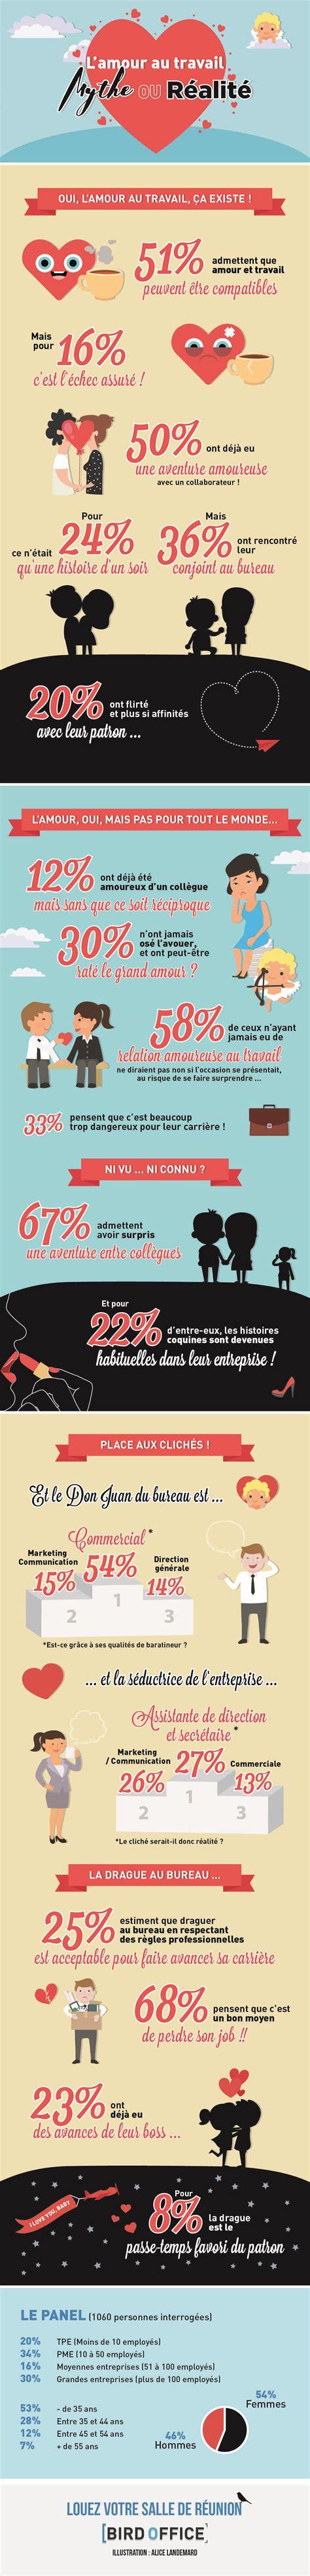 amour bureau l 39 amour au bureau l 39 infographie bird office